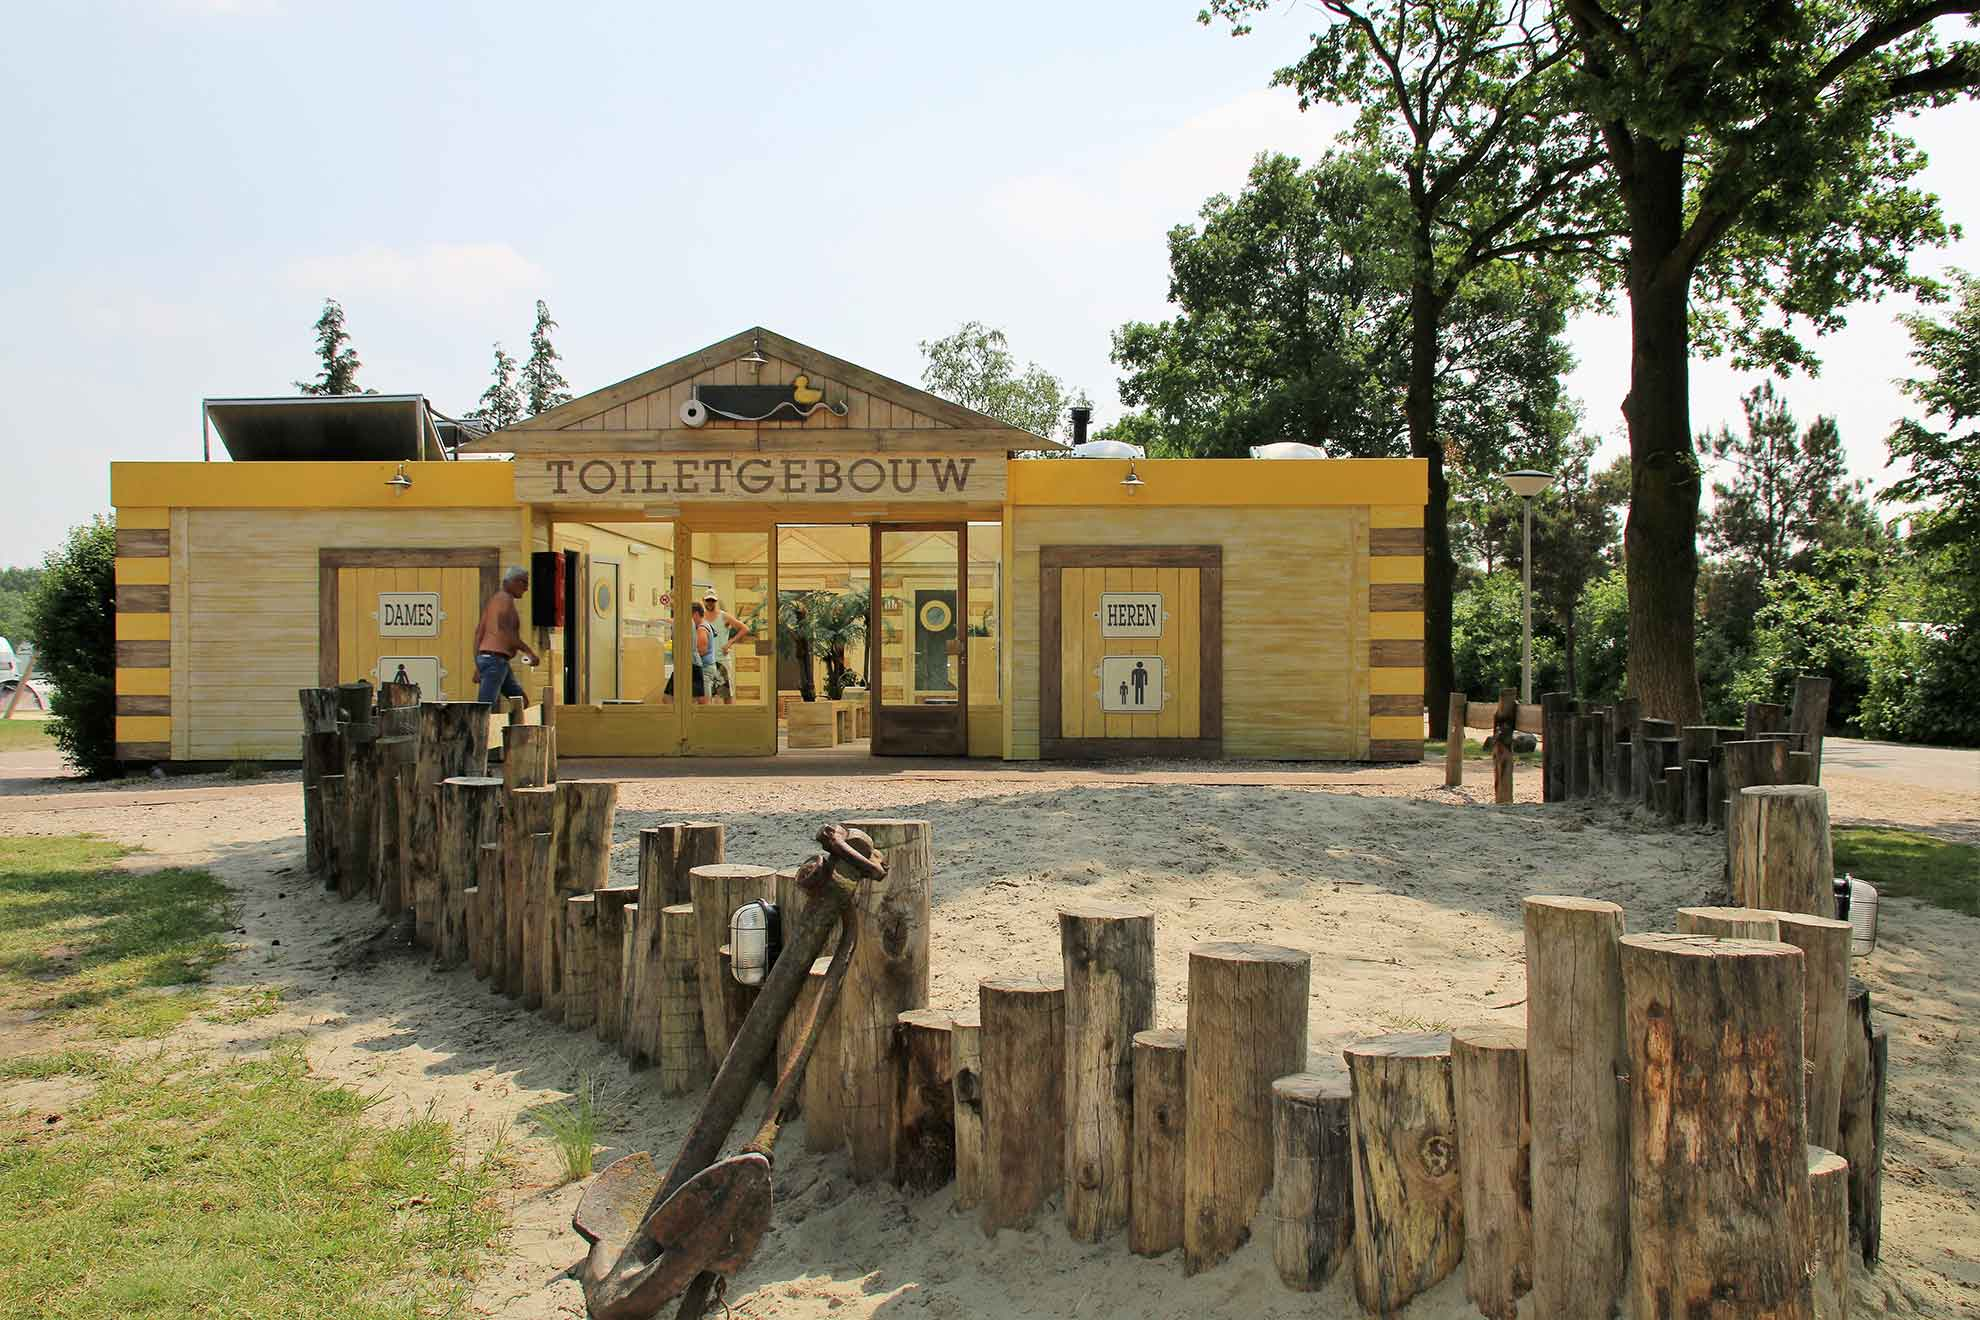 Sanitäranlagen auf dem Campingplatz Het Stoetenslagh - Sanitäranlagen auf dem Campingplatz Stoetenslagh